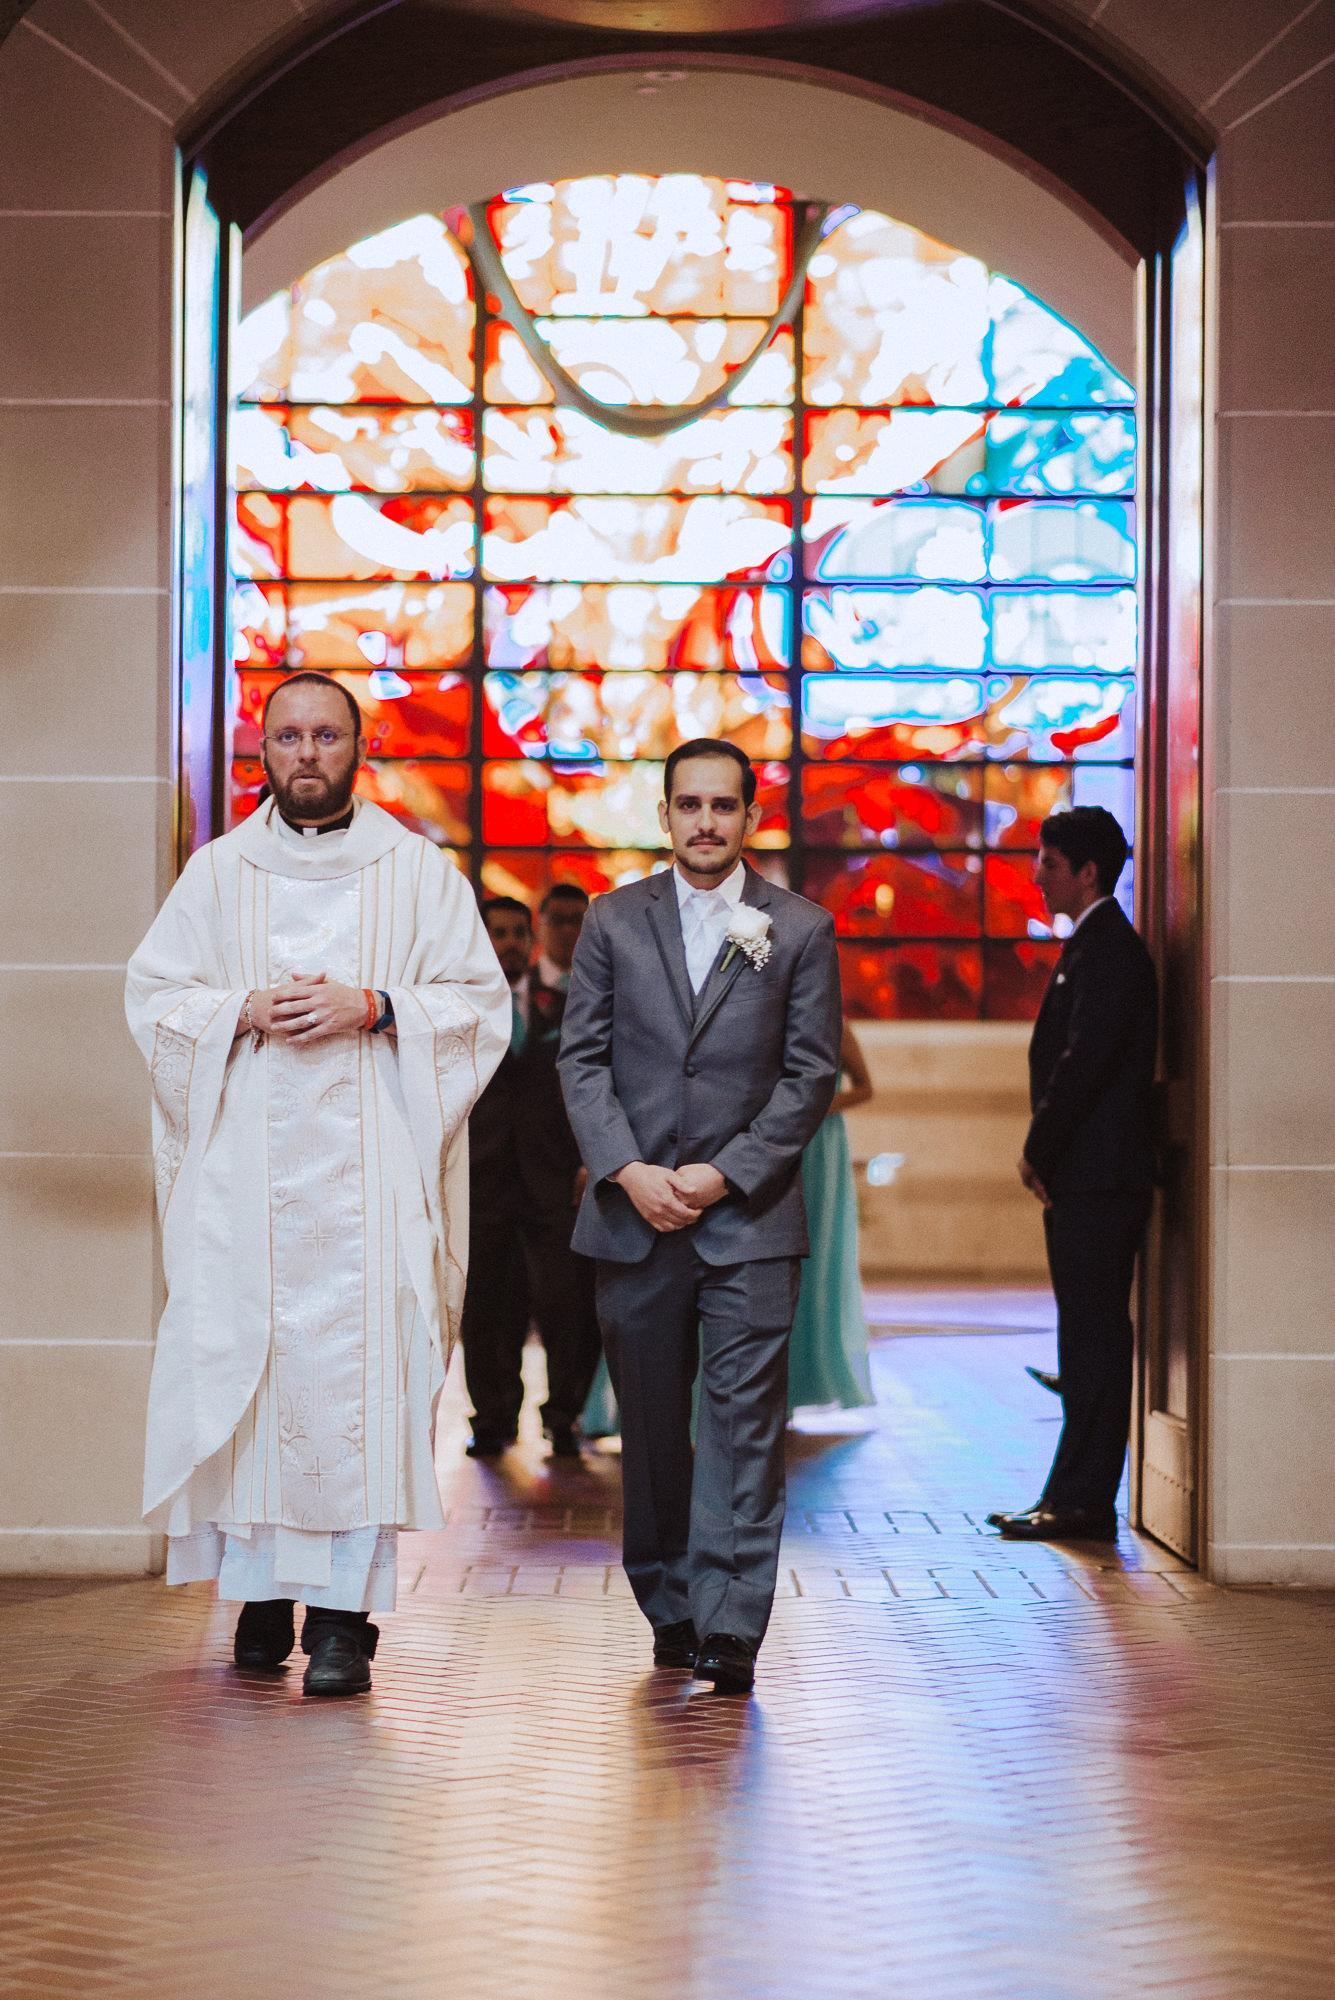 Groom walks down the aisle with Priest